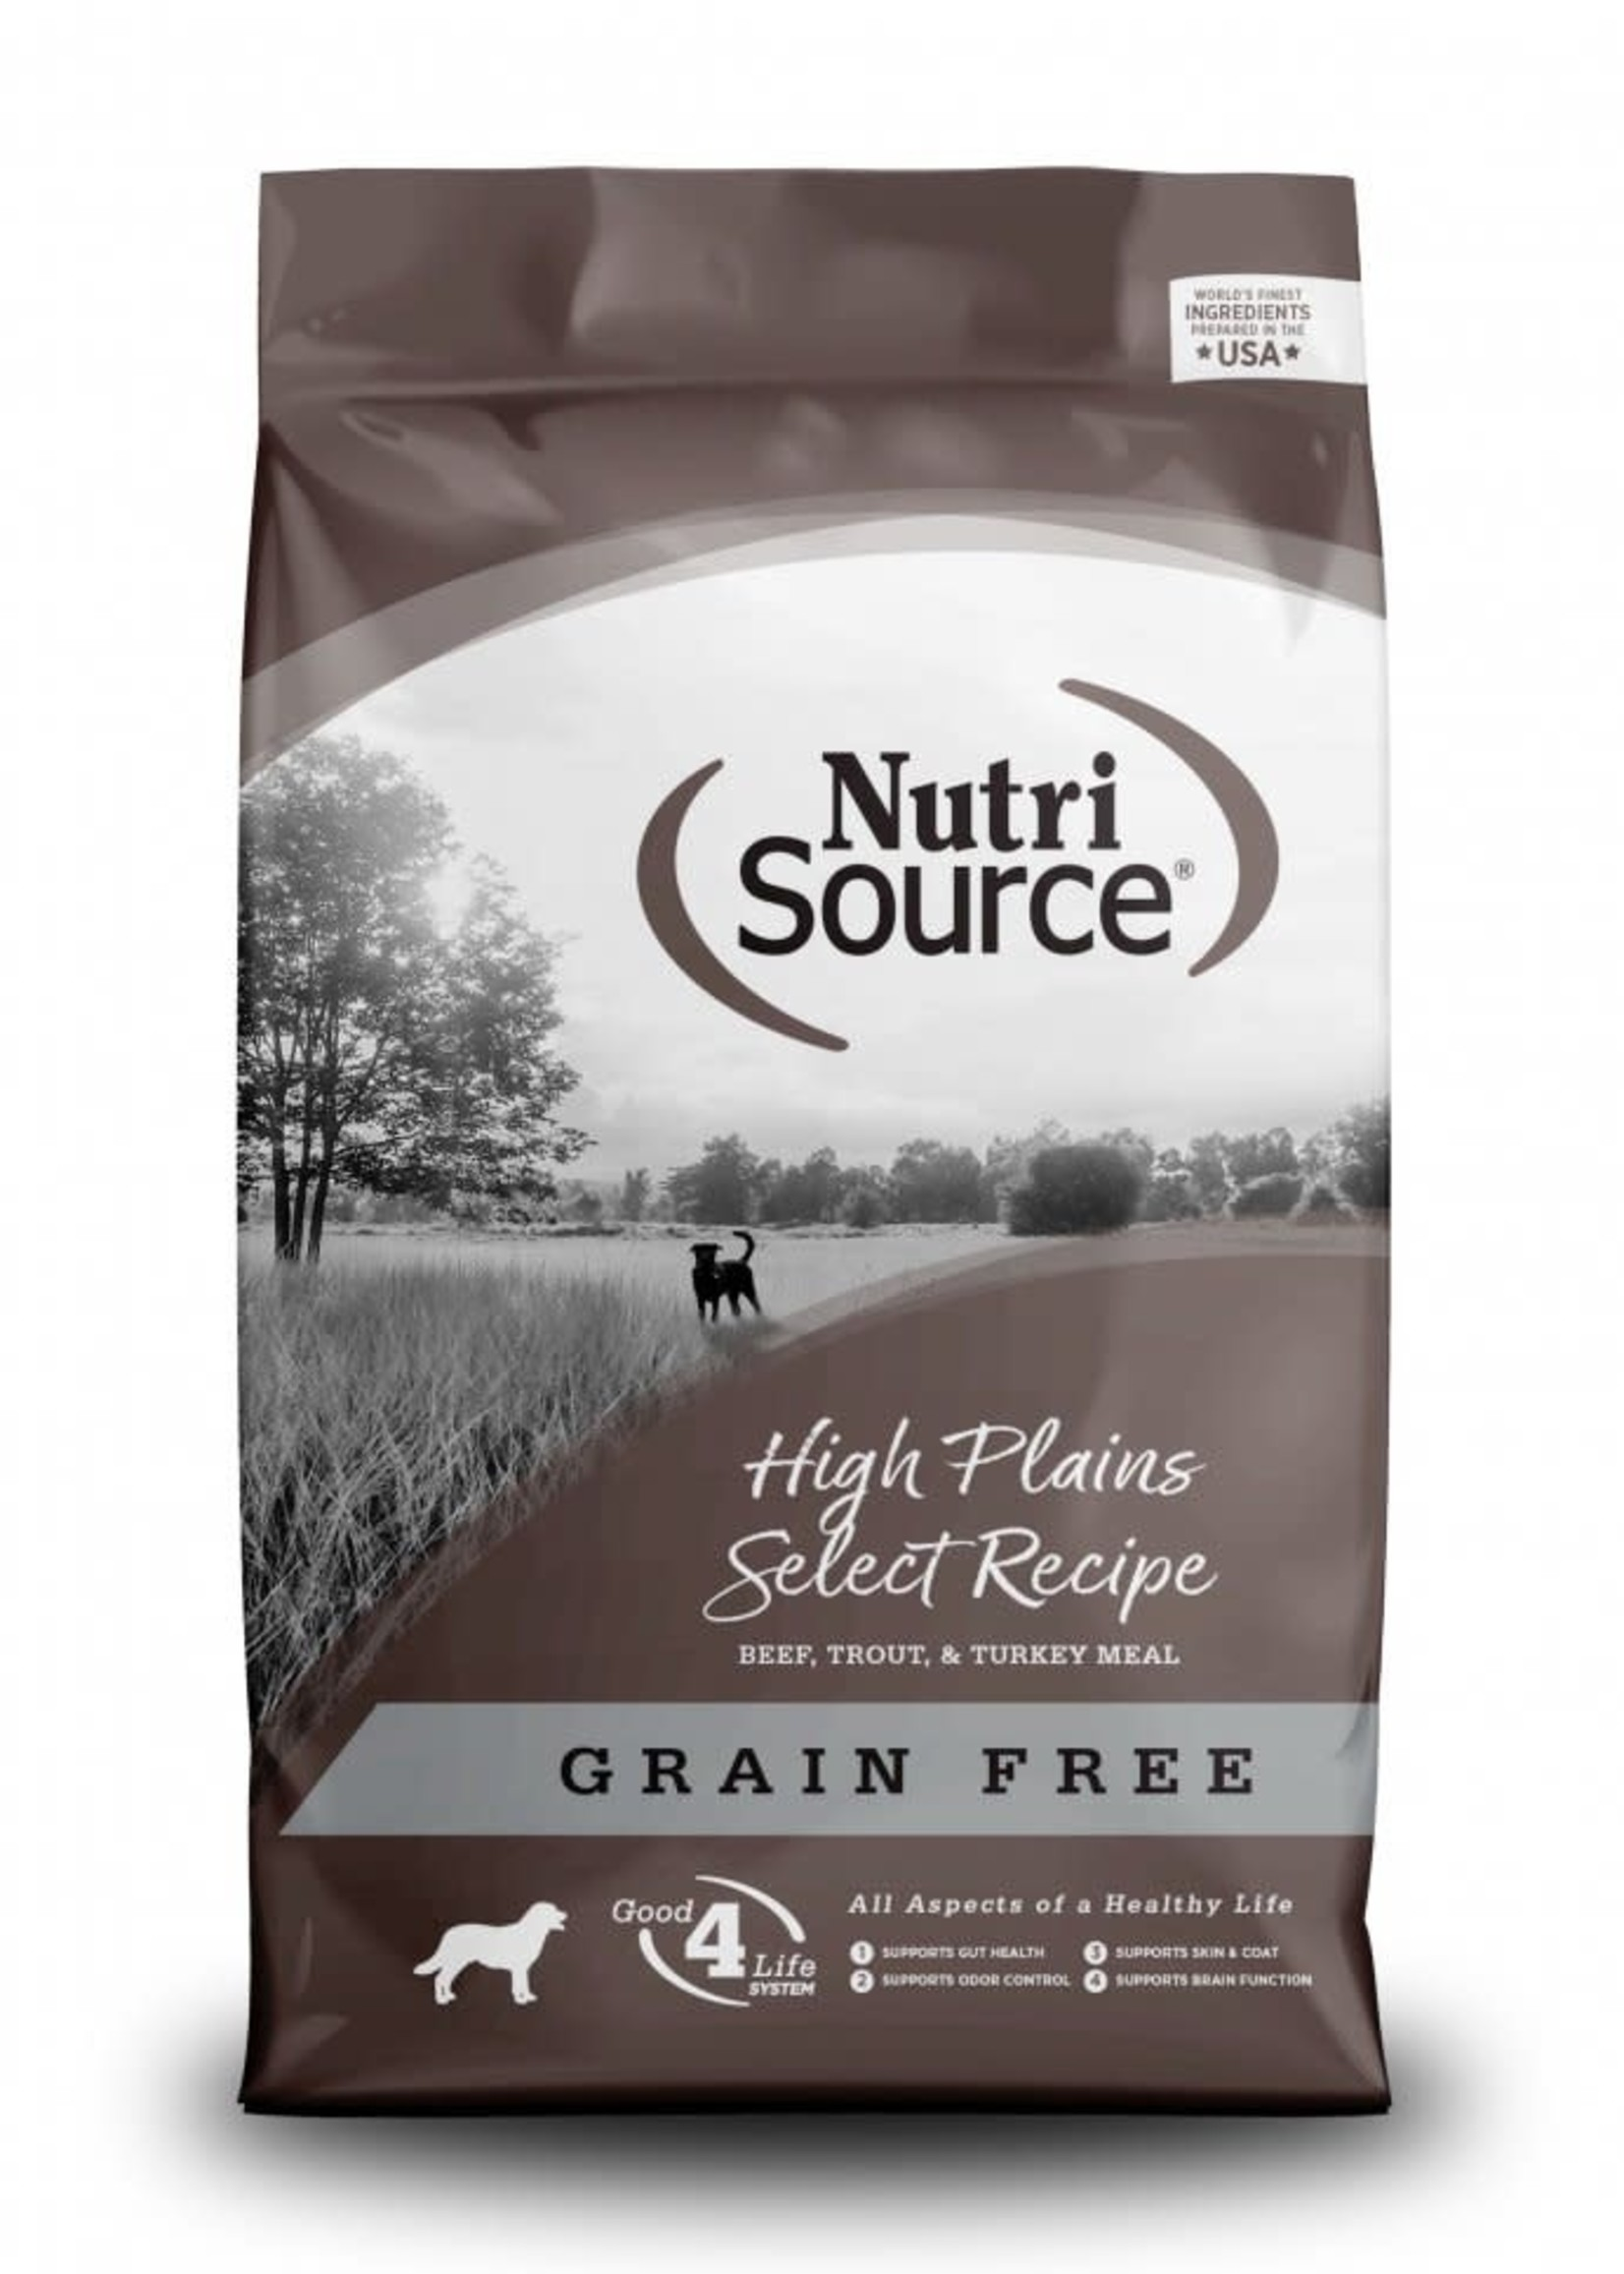 Nutrisource Nutrisource Grain-Free High Plains Select Dry Dog Food 5lbs